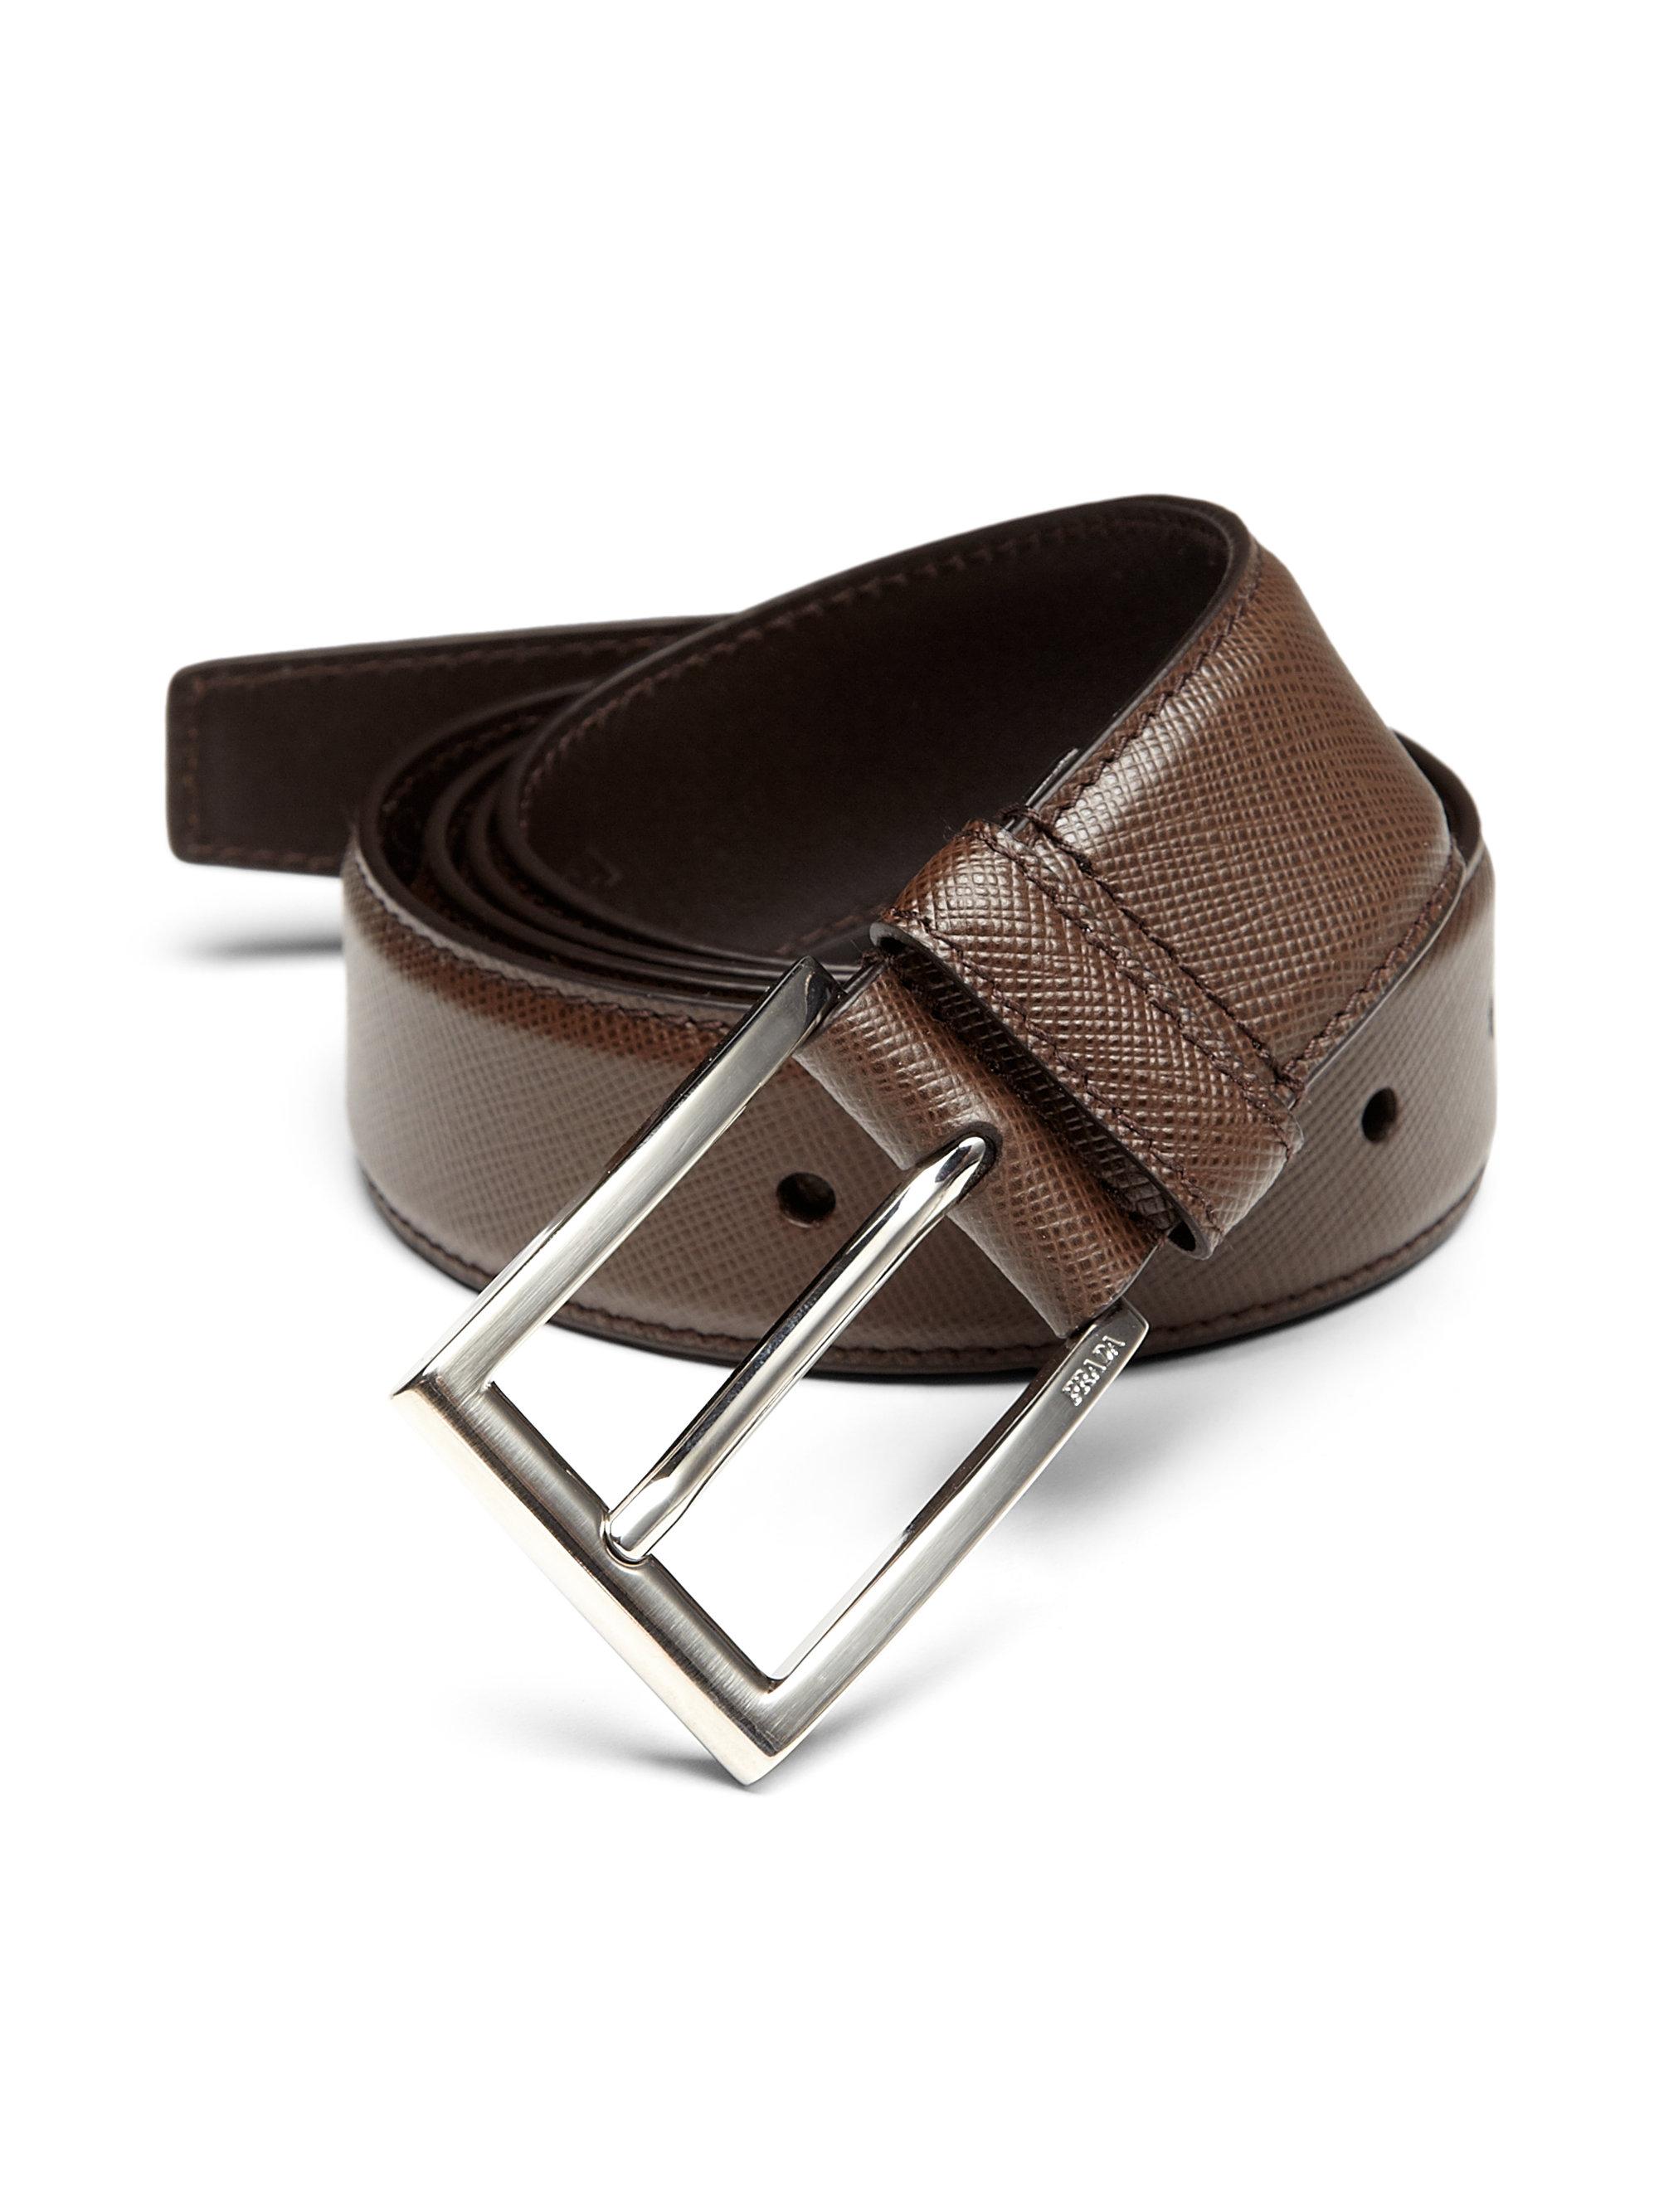 c559ea66ada90 ... discount code for lyst prada saffiano dress belt in brown e25d6 dc6ad